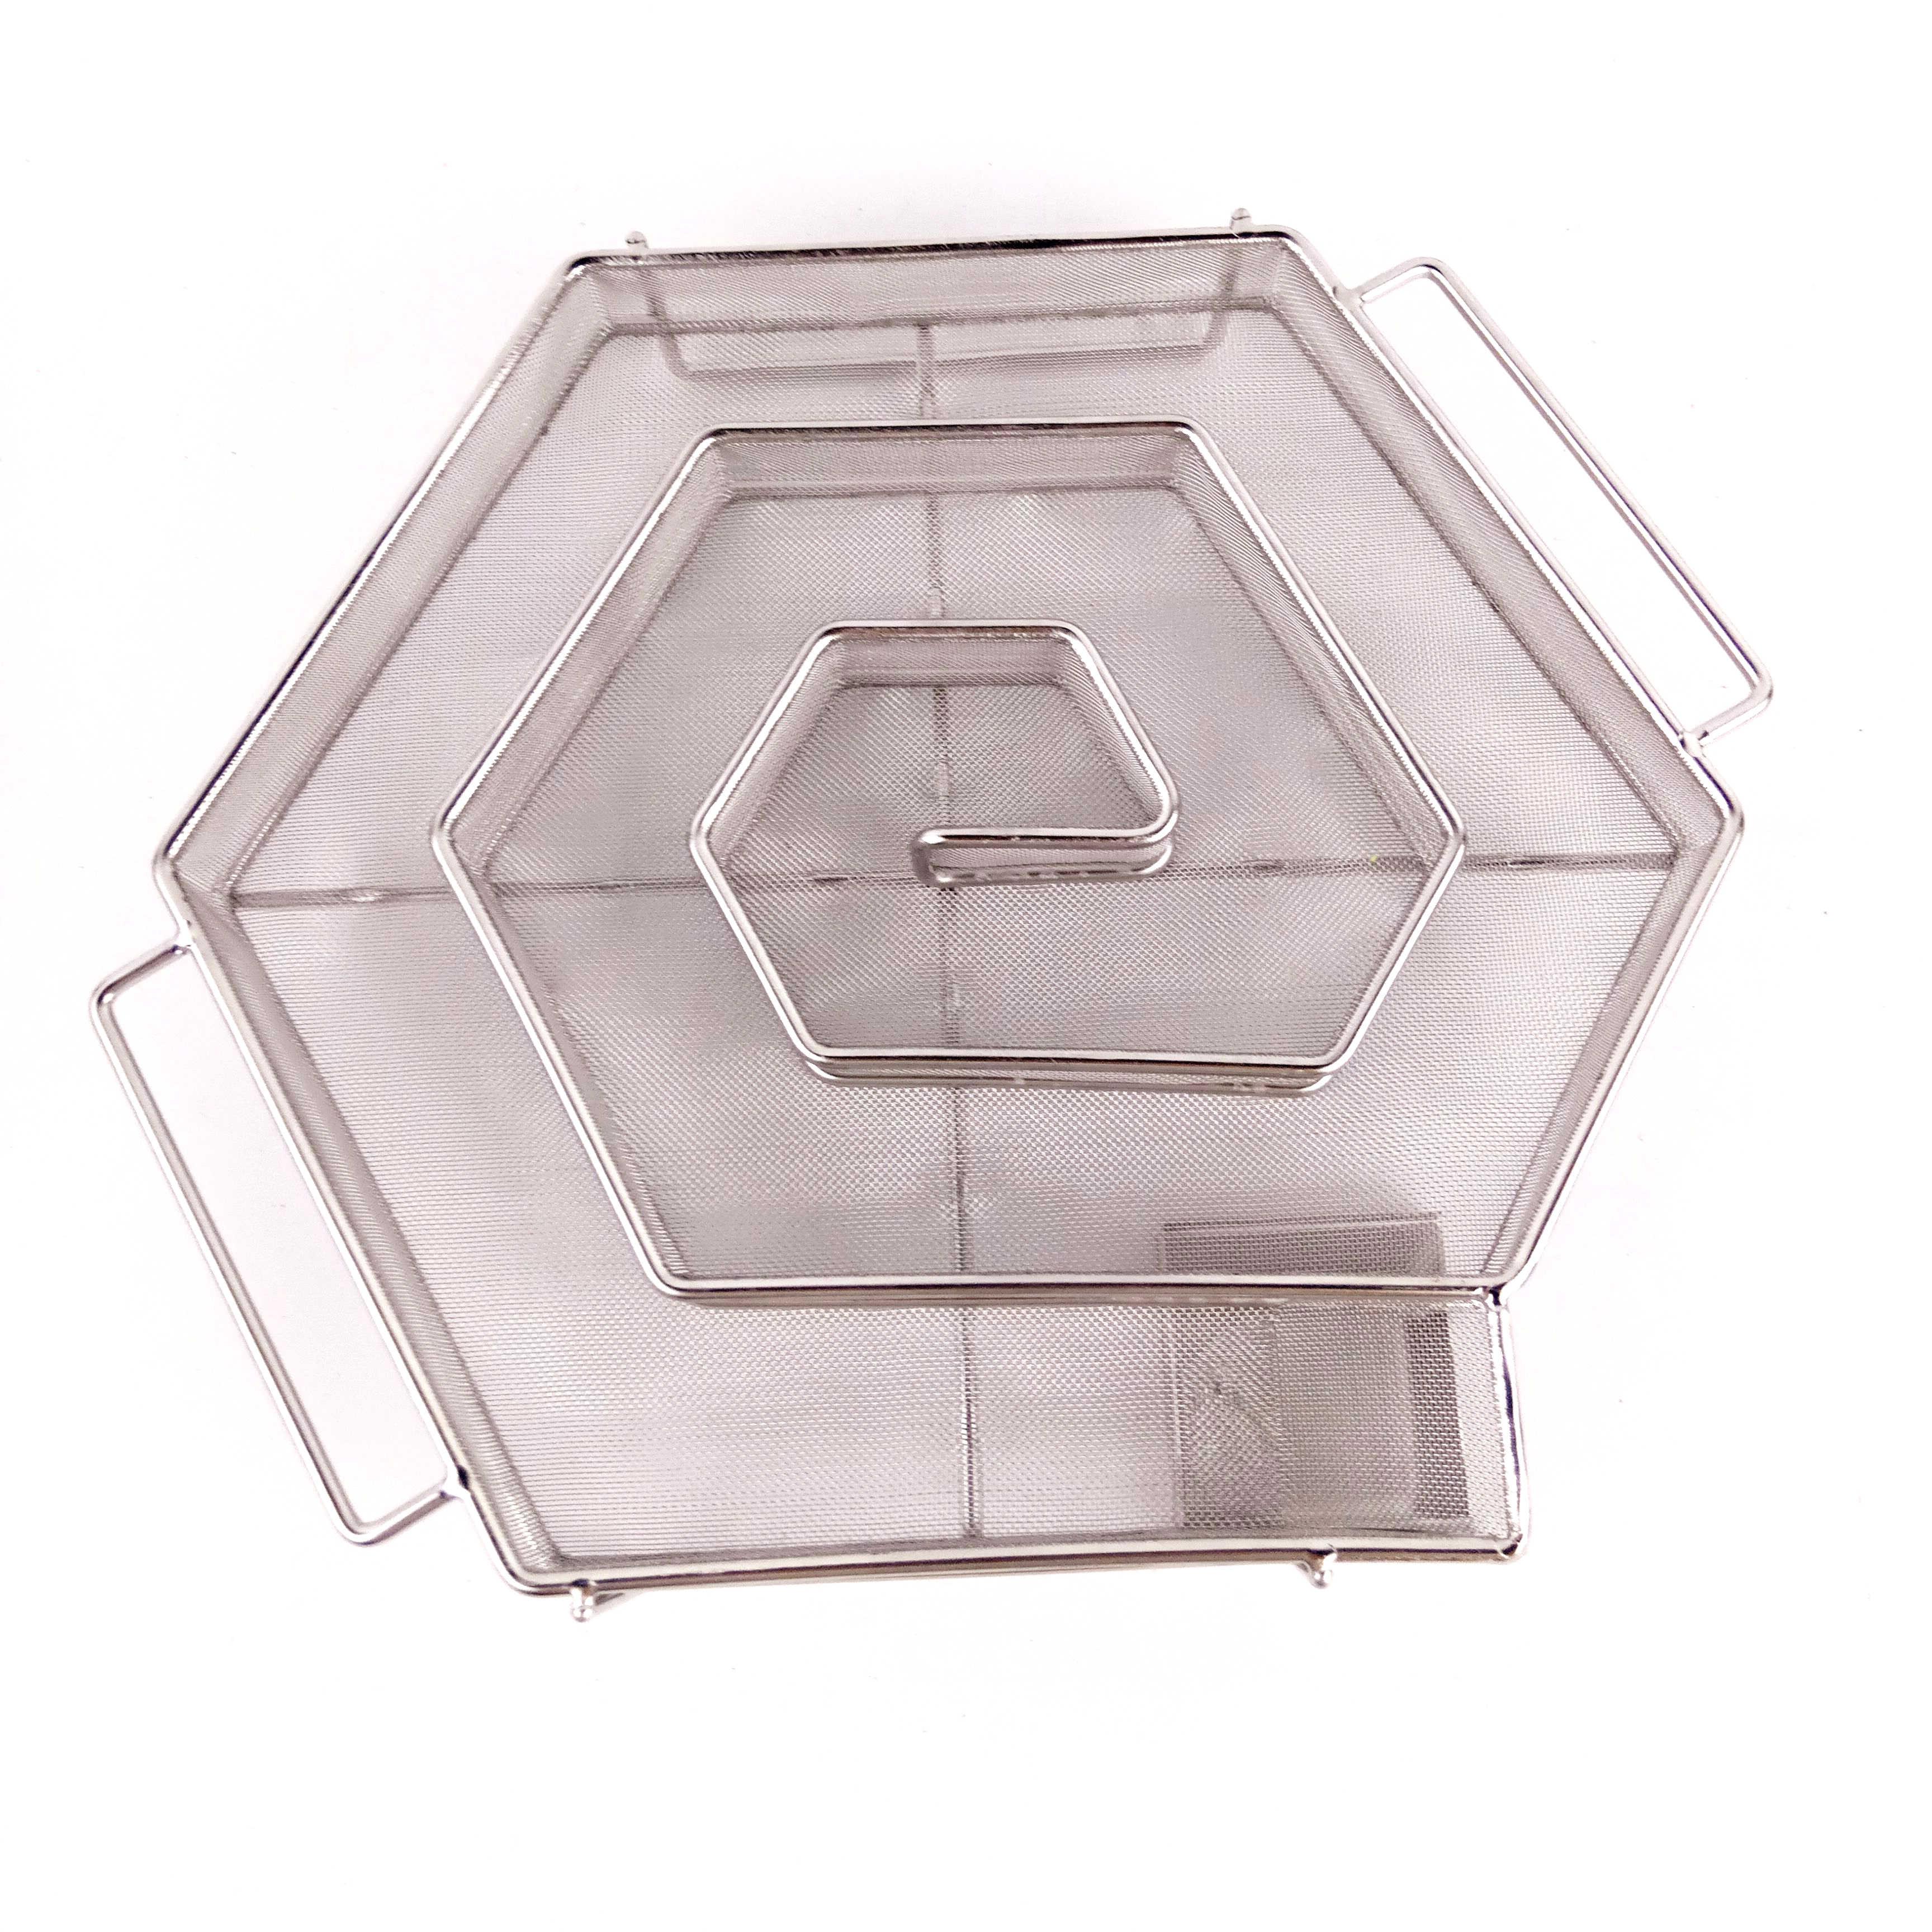 Caja De Generador Frio De Humo Para Barbacoa Hexagono De Manzana